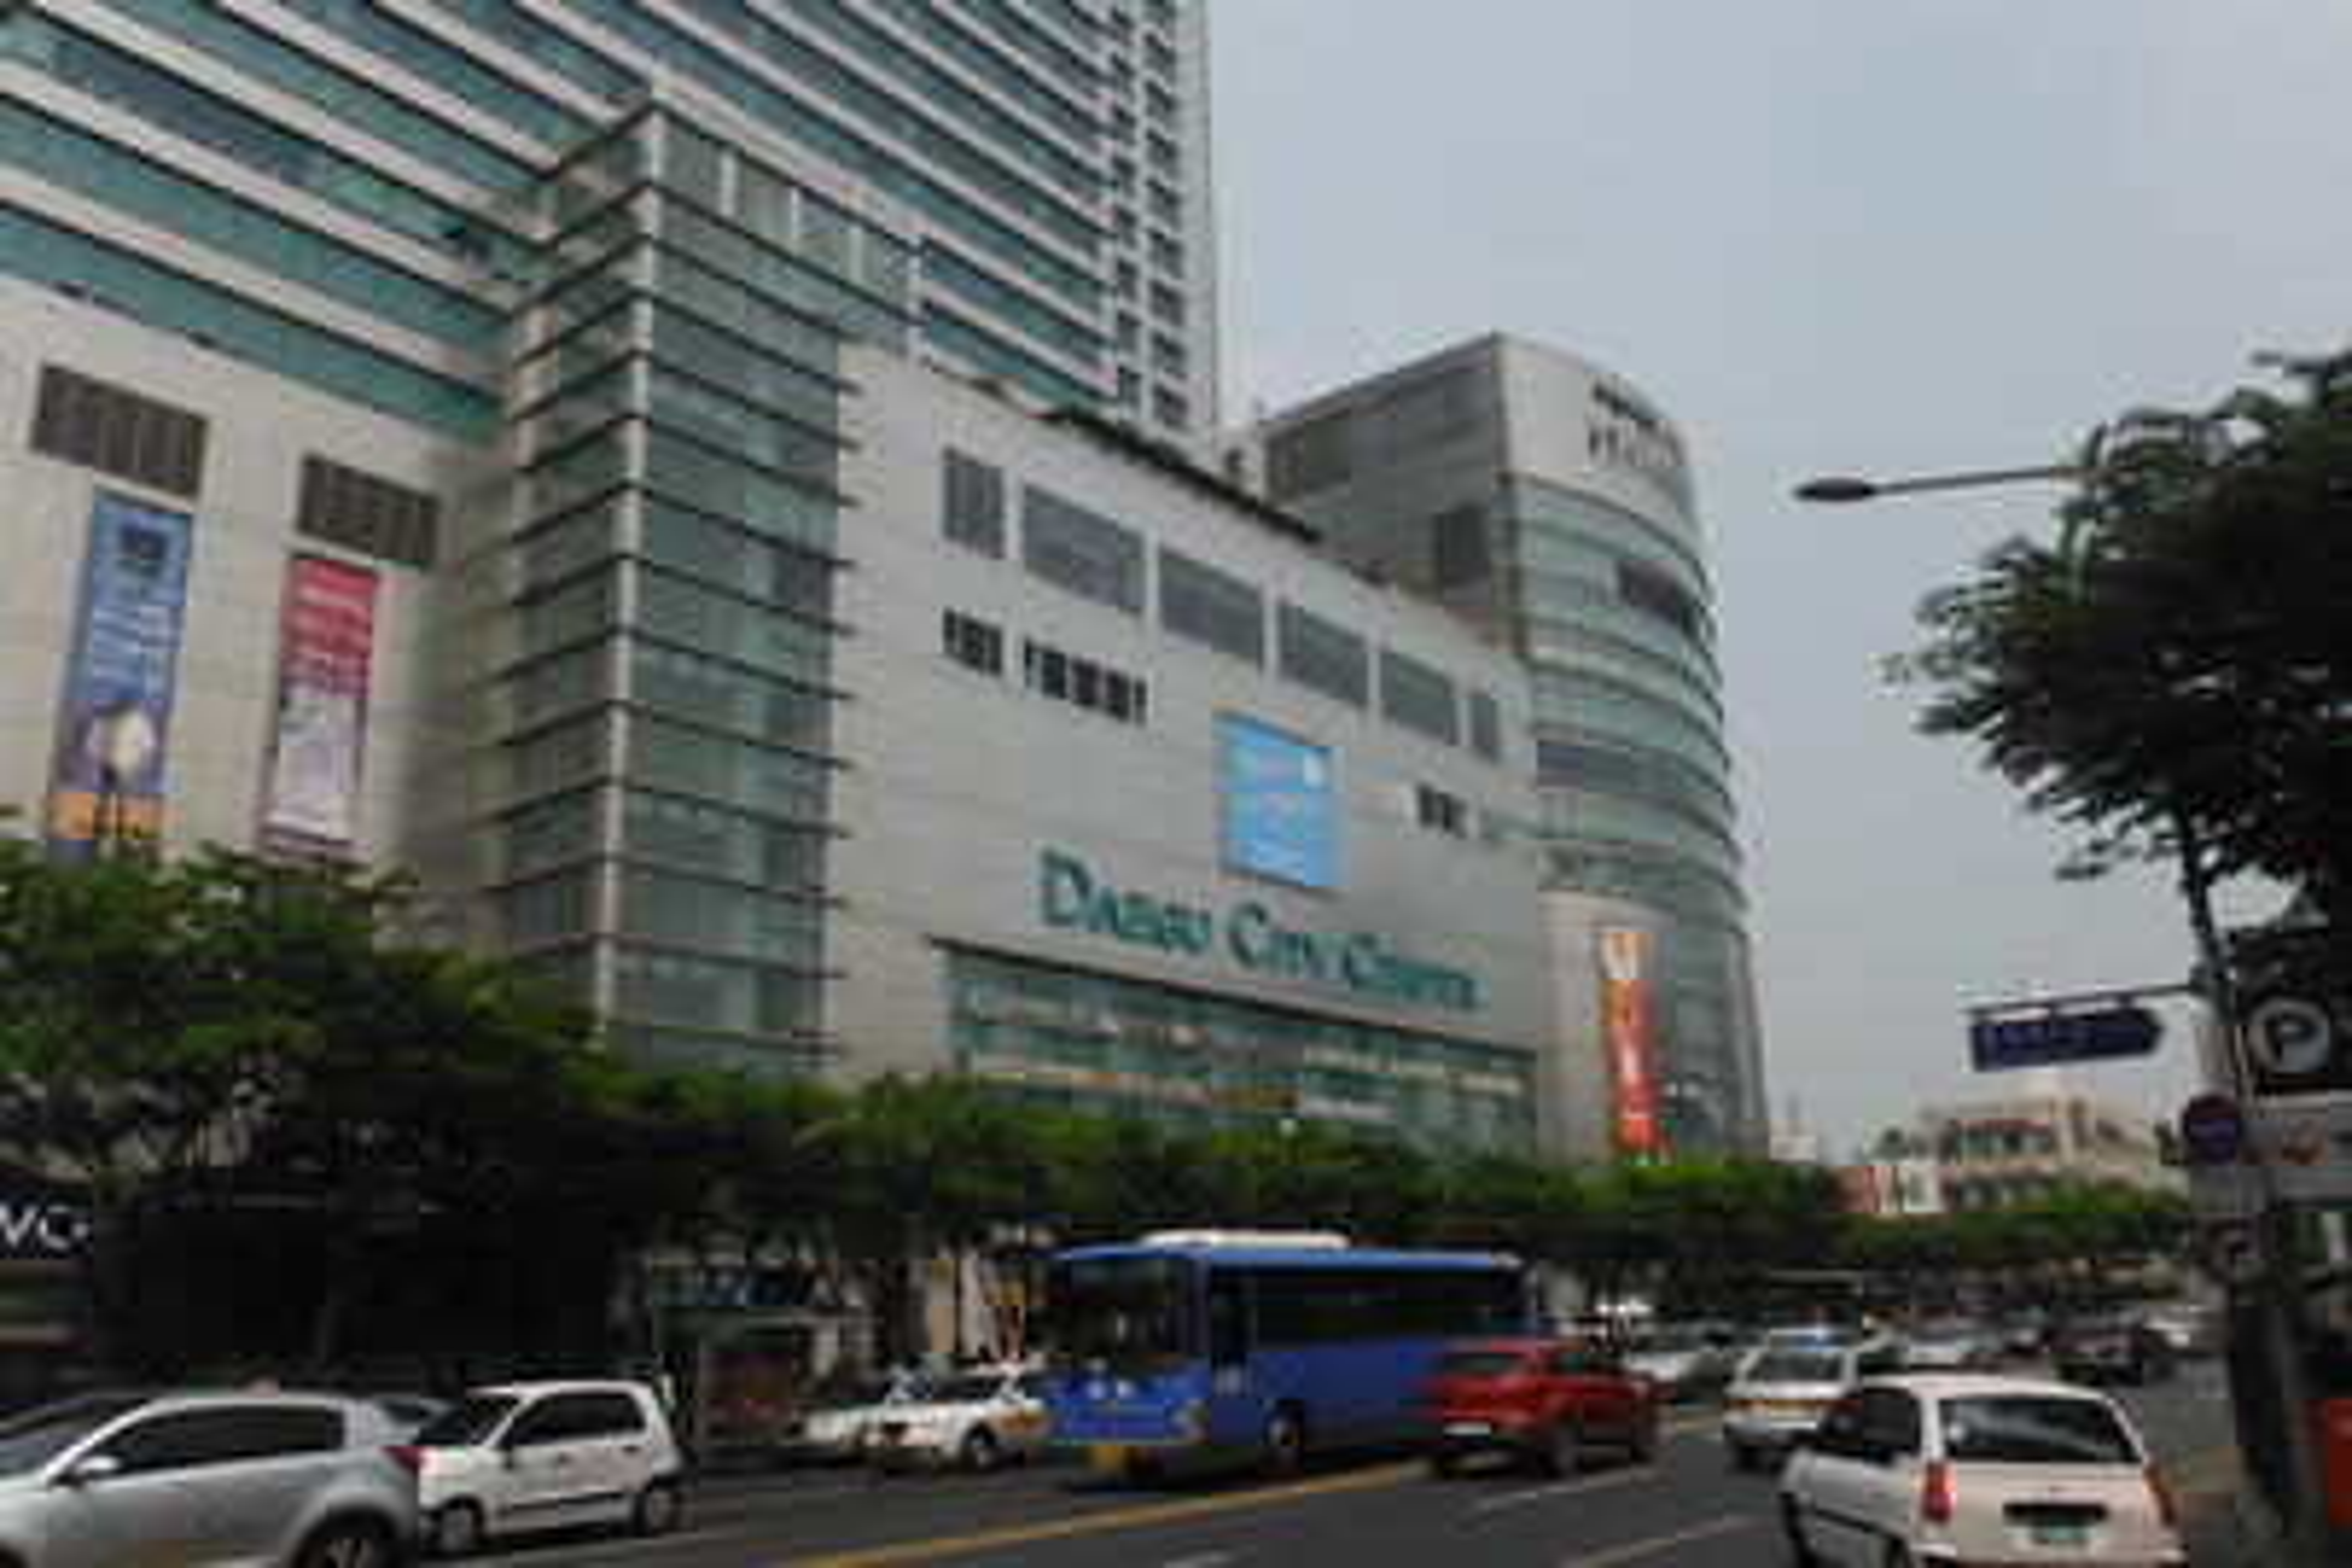 Daegu City Centre, Tecah Eneglish Abroad